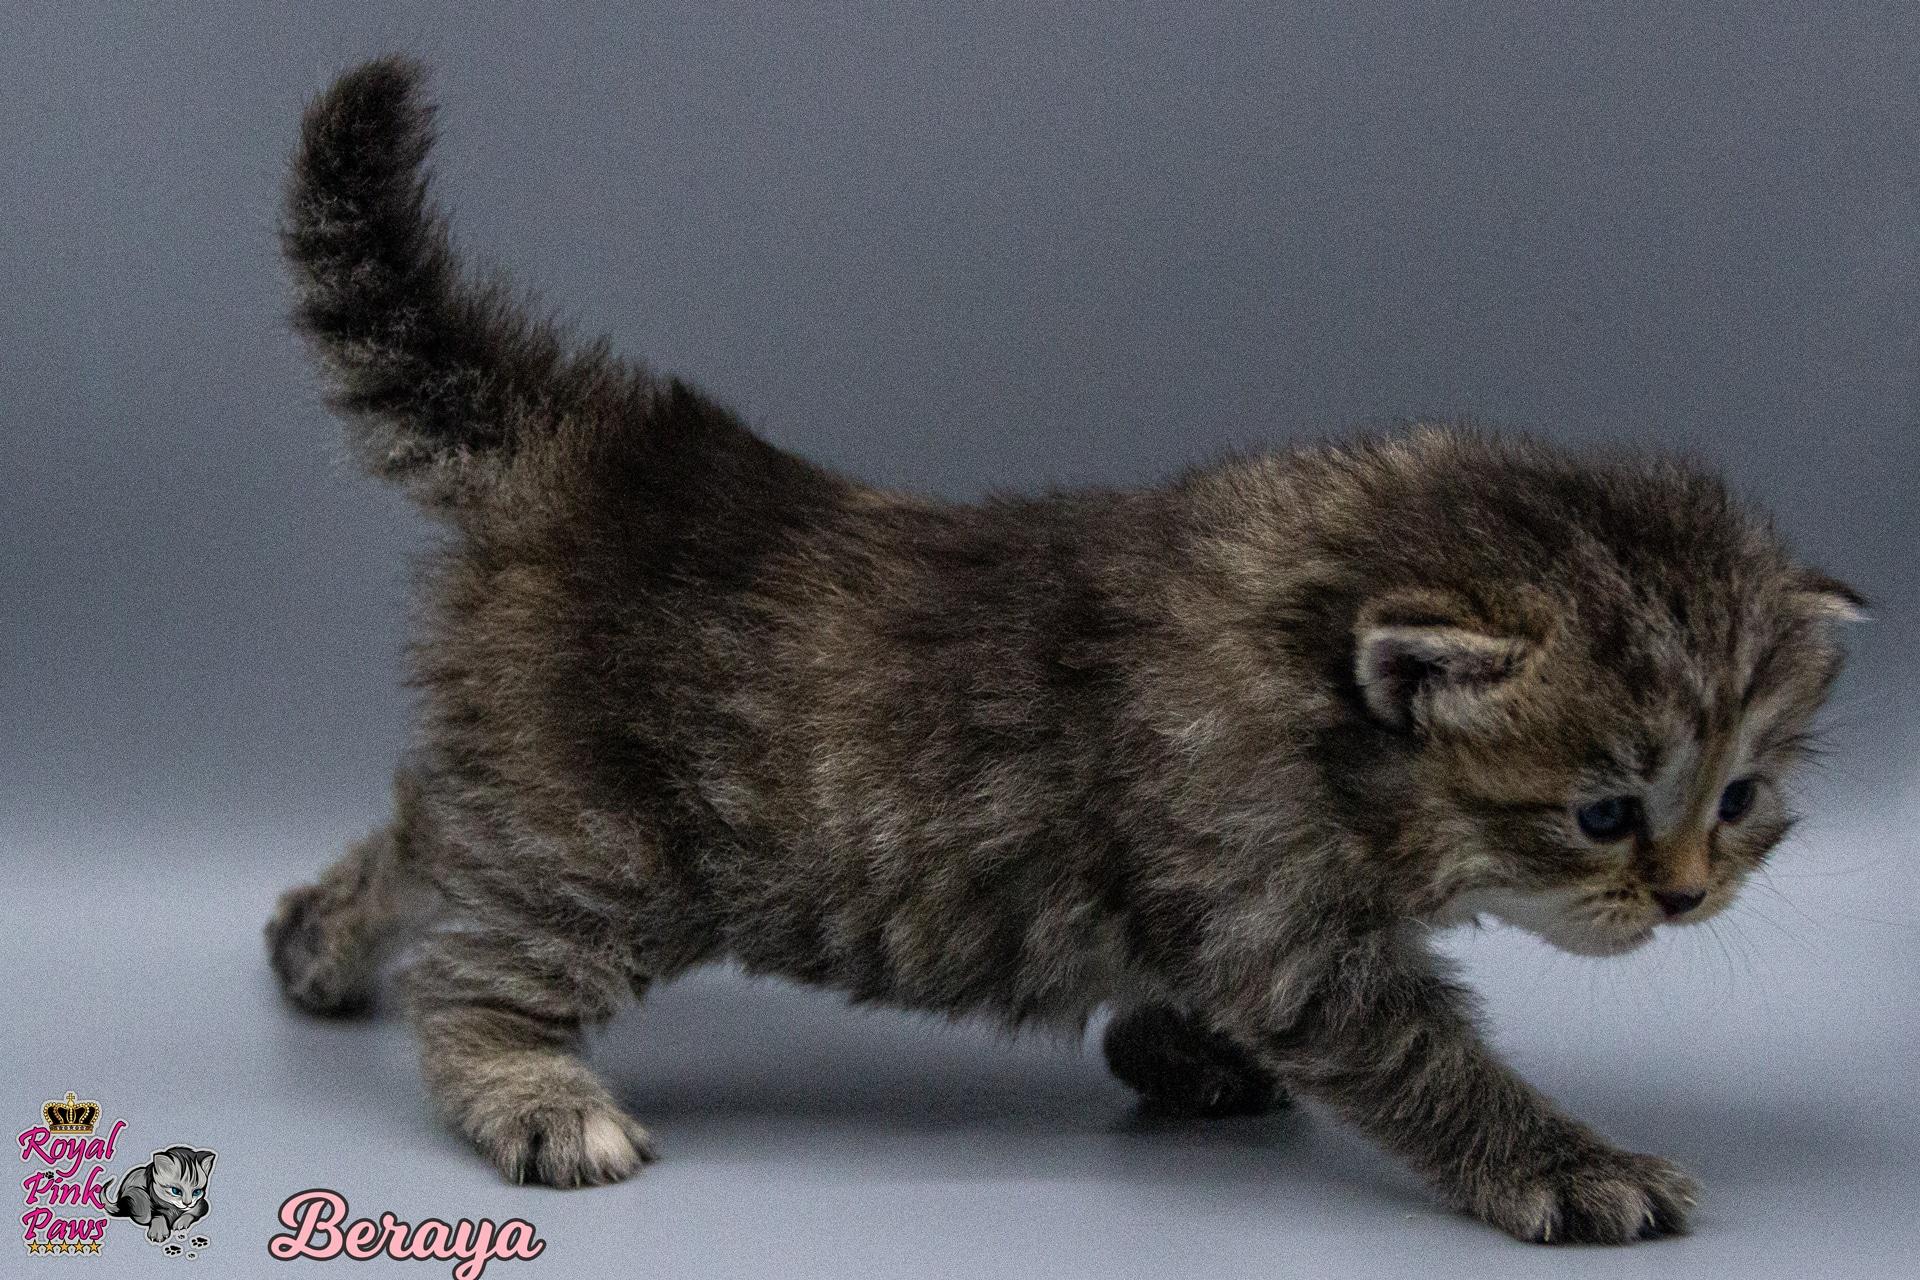 Sibirische Katze - Beraya Royal Pink Paws